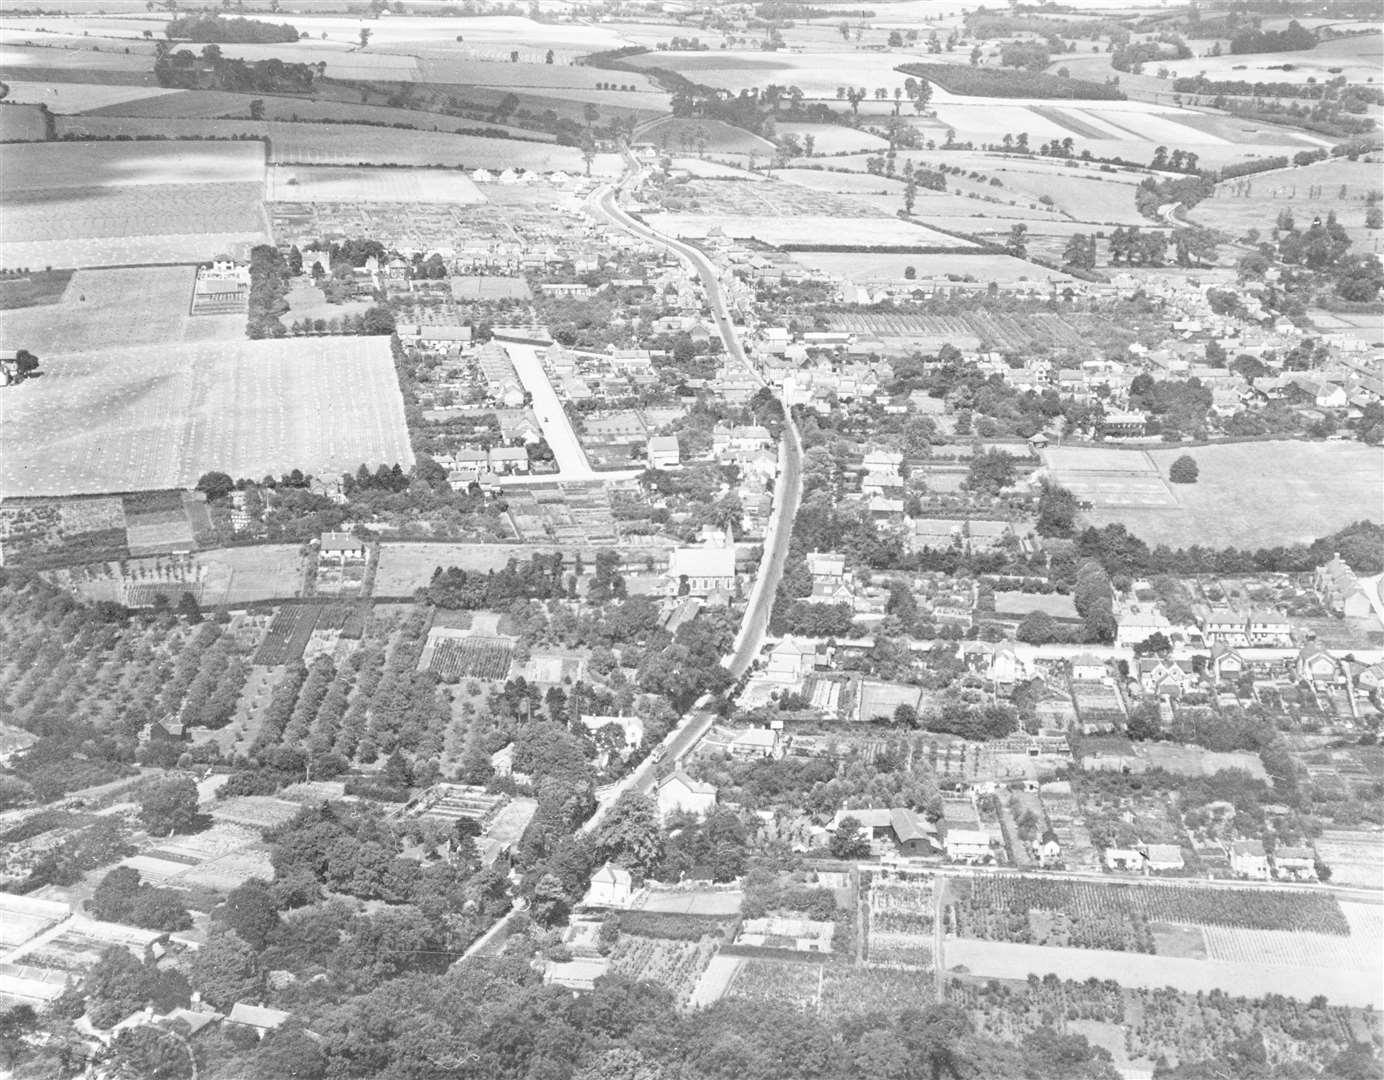 Sawbridgeworth in 1929 Credit: Historic England